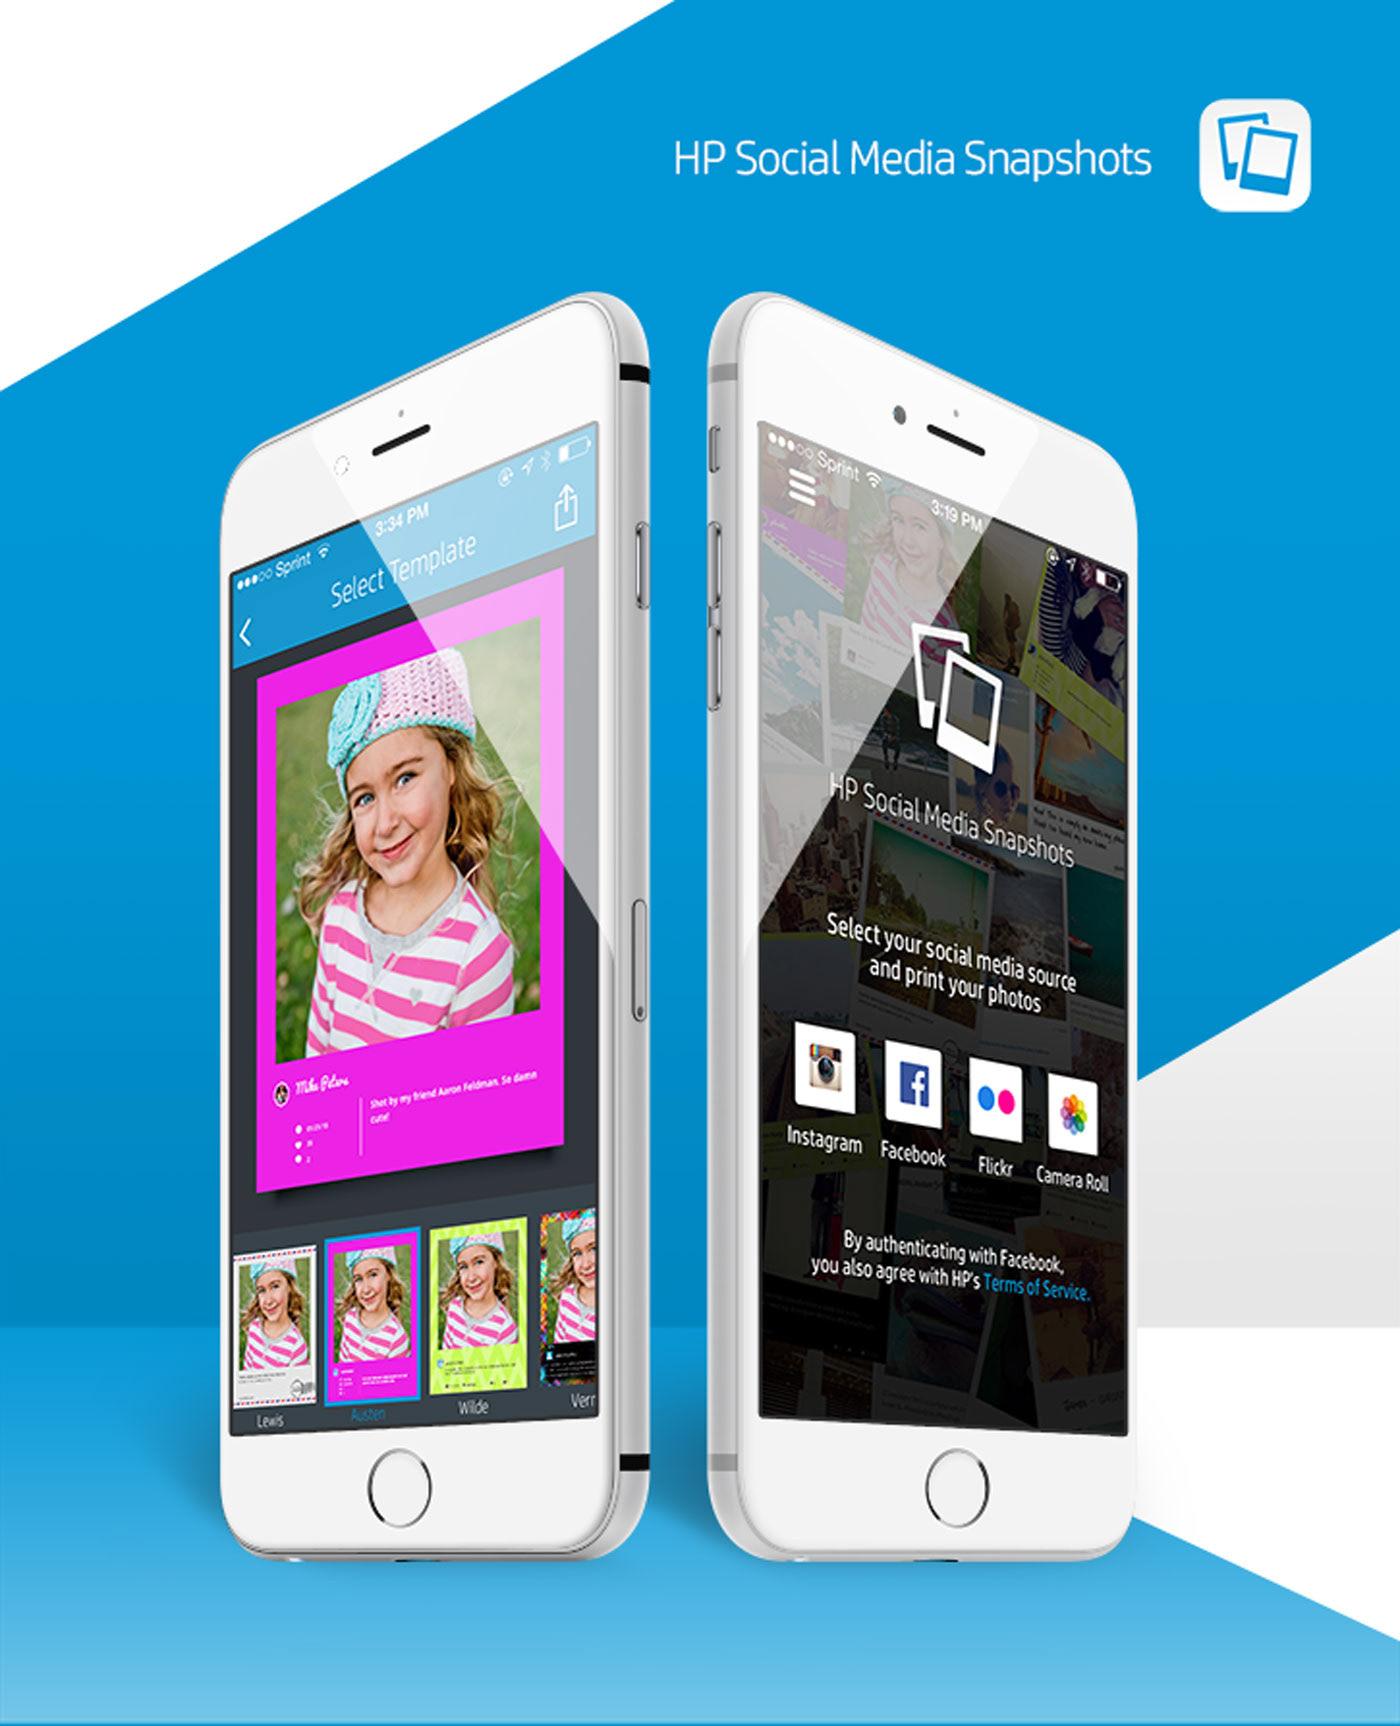 Mike Peters Hp Social Media Snapshots Mobile App